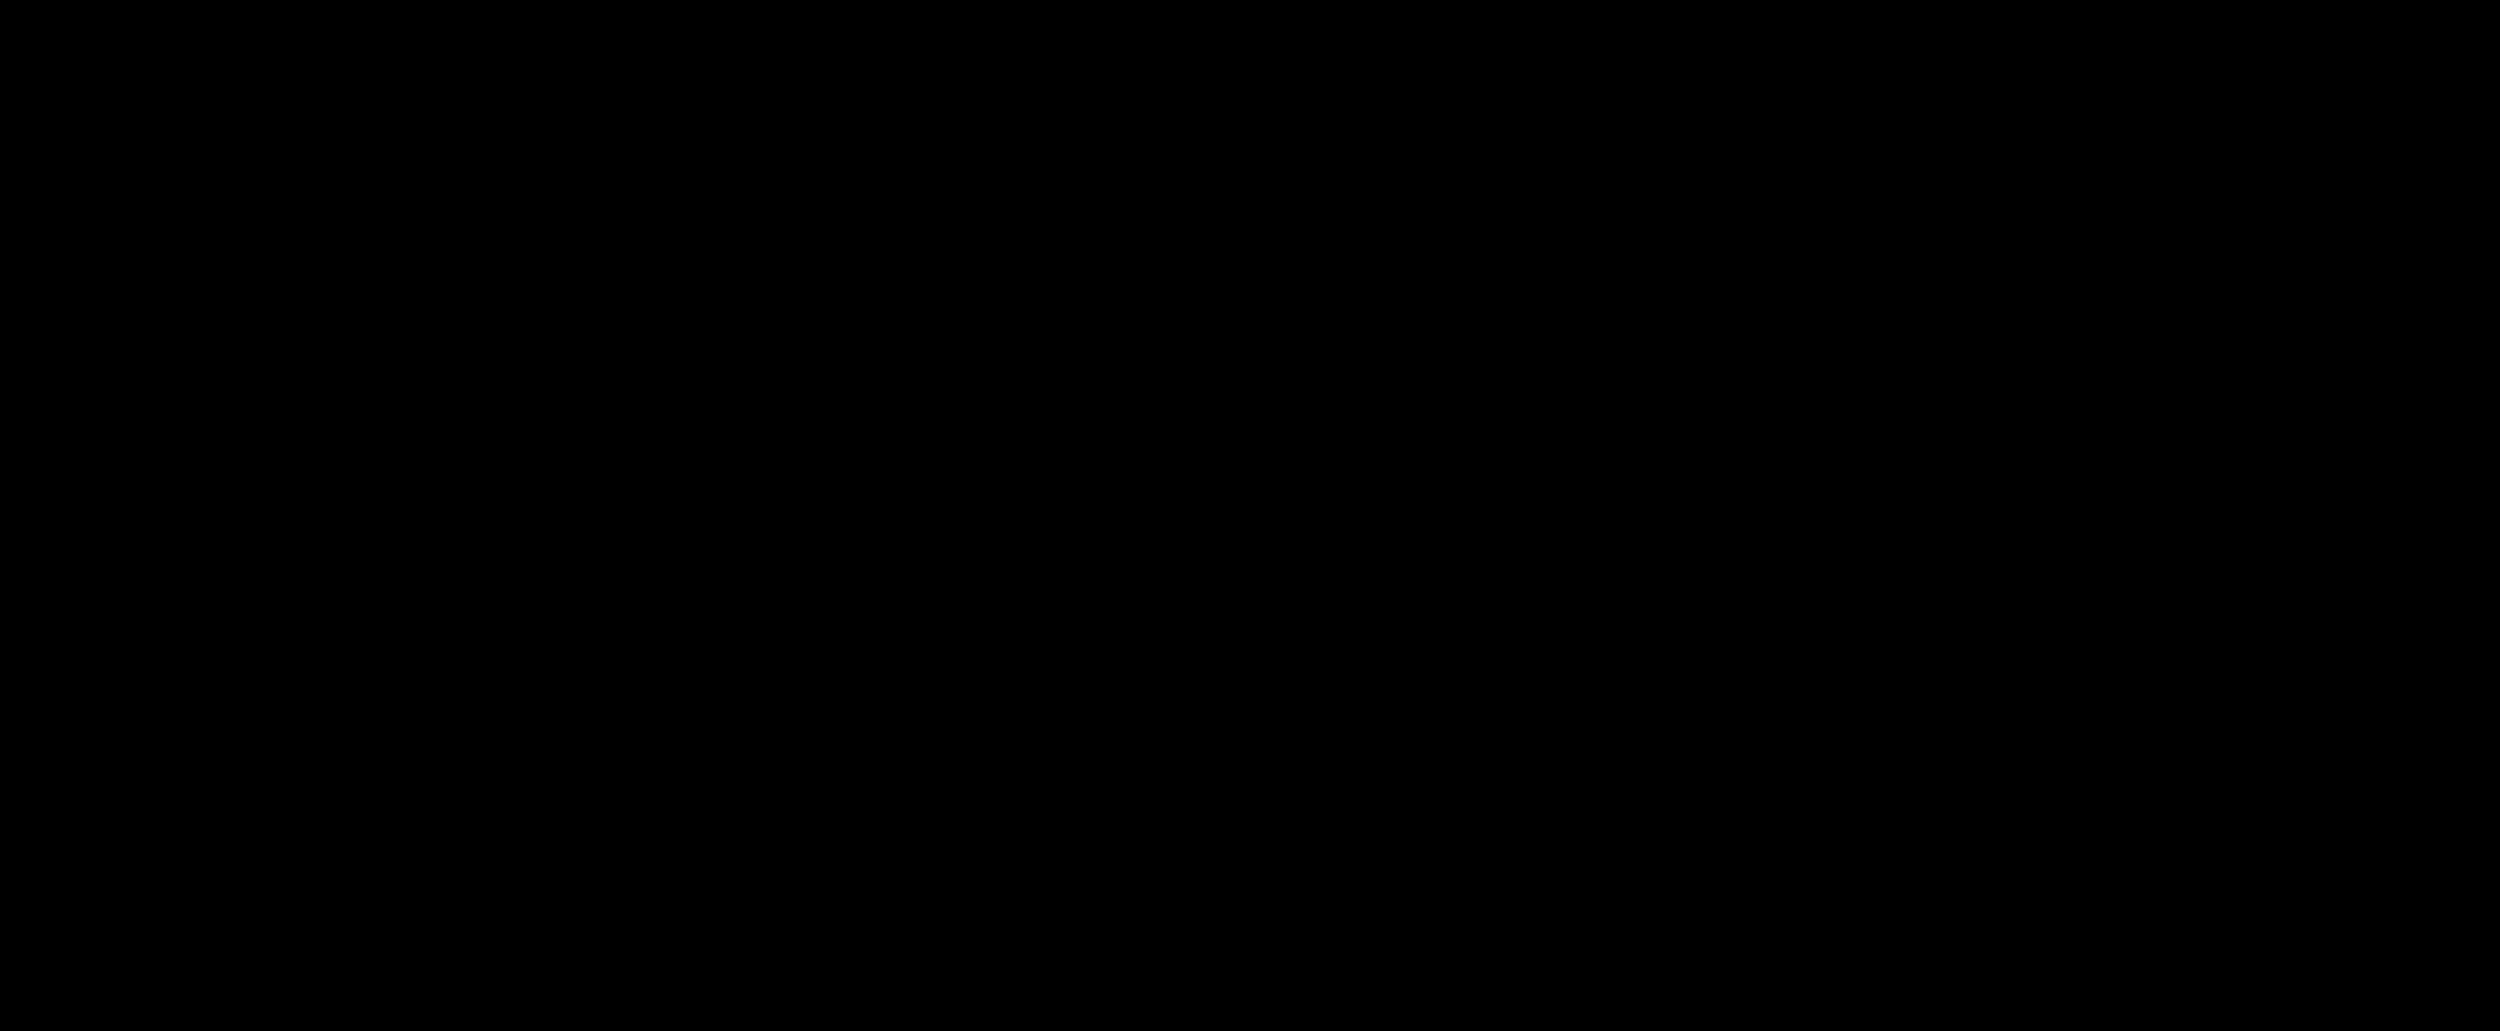 Fusion Intensive Logo-27.png